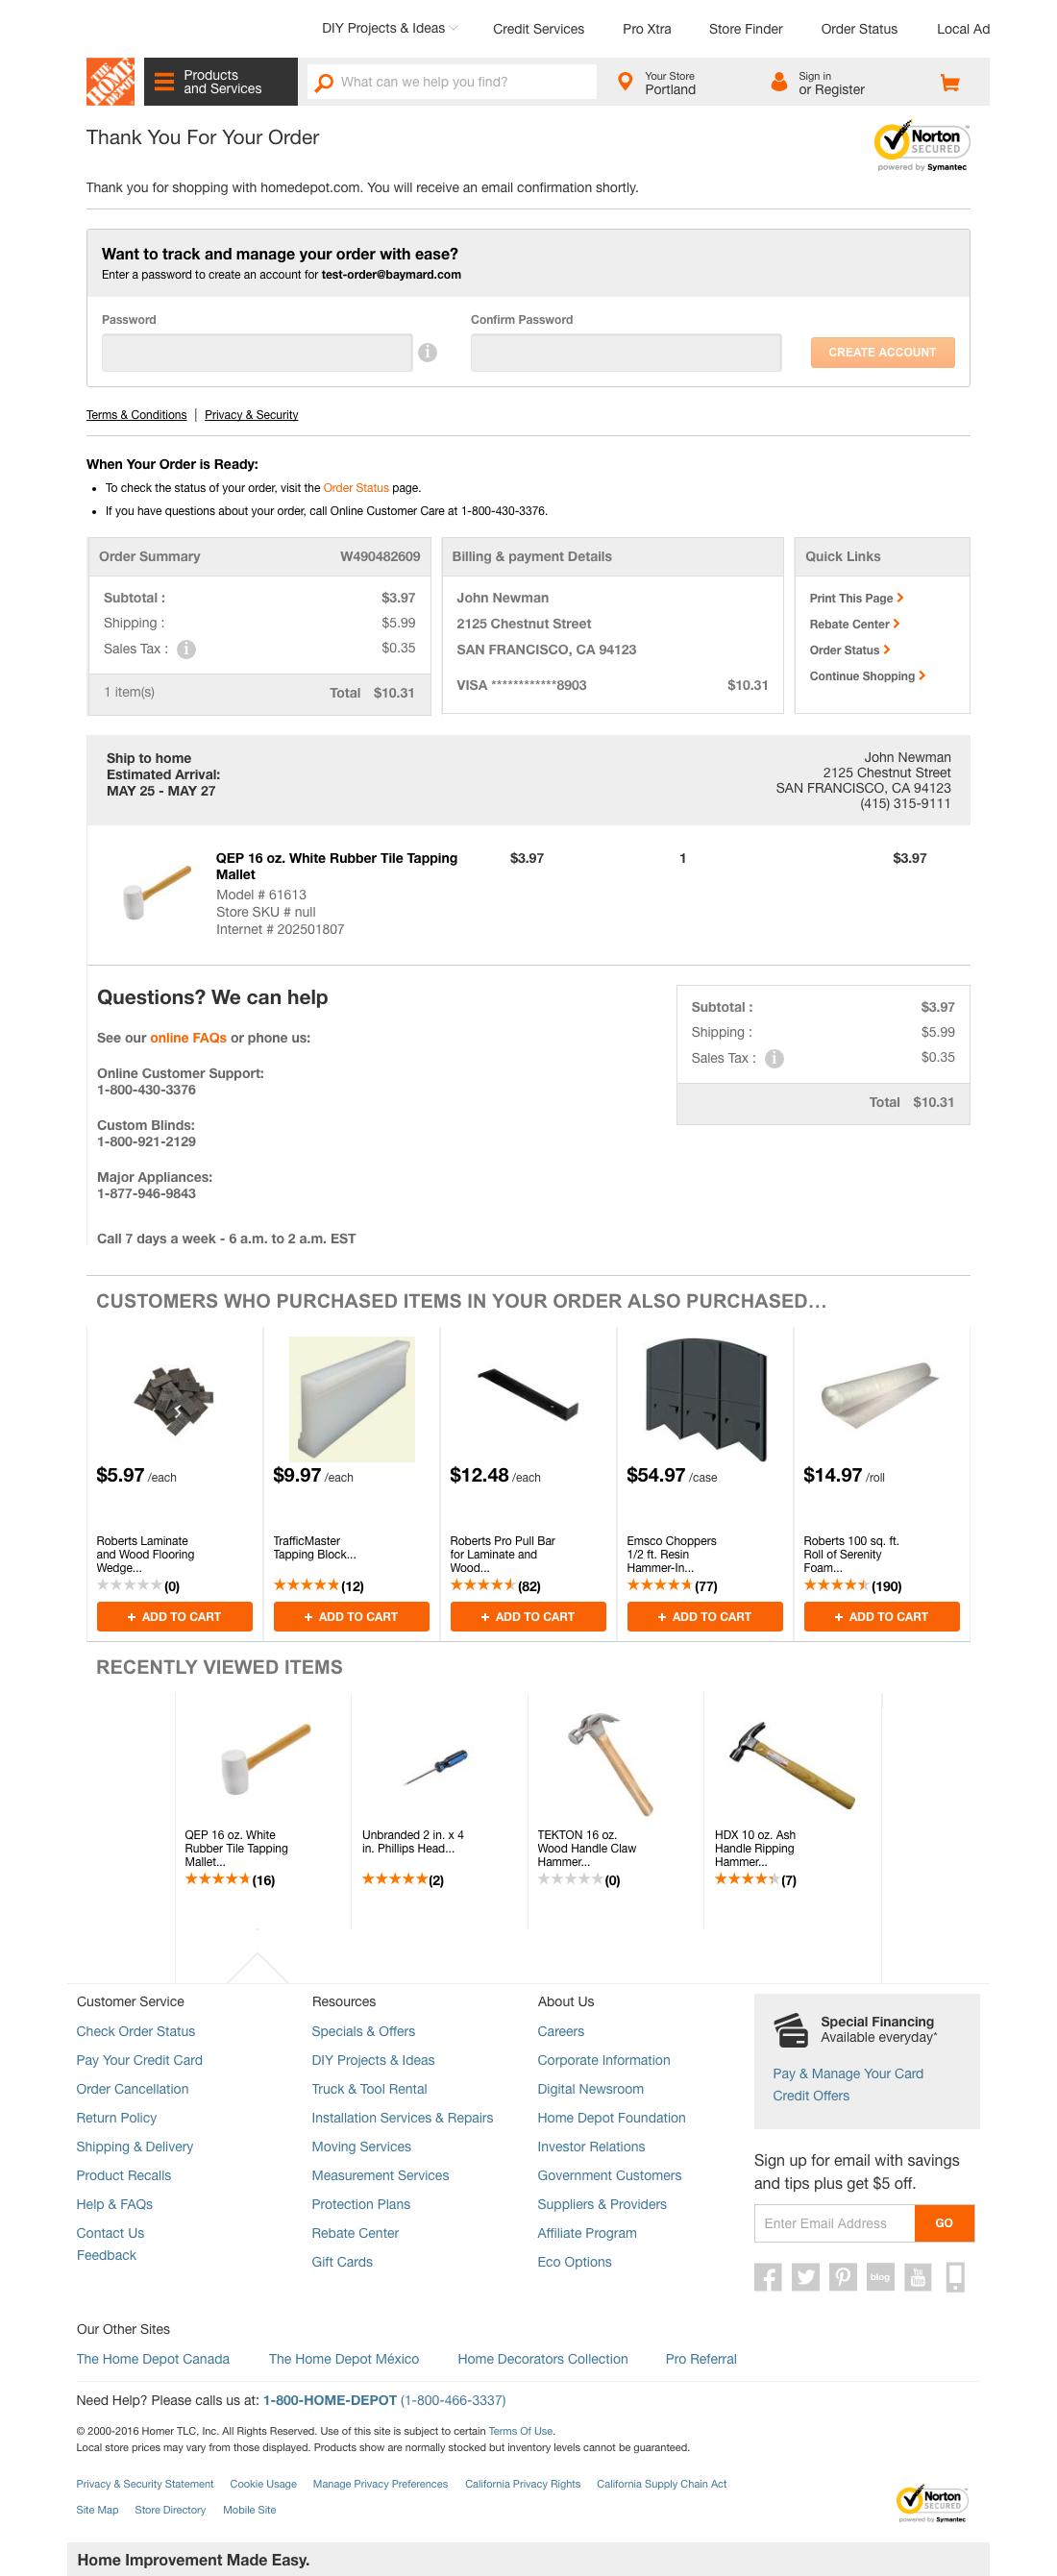 home depot 61 examples of order confirmation checkout steps baymard institute. Black Bedroom Furniture Sets. Home Design Ideas